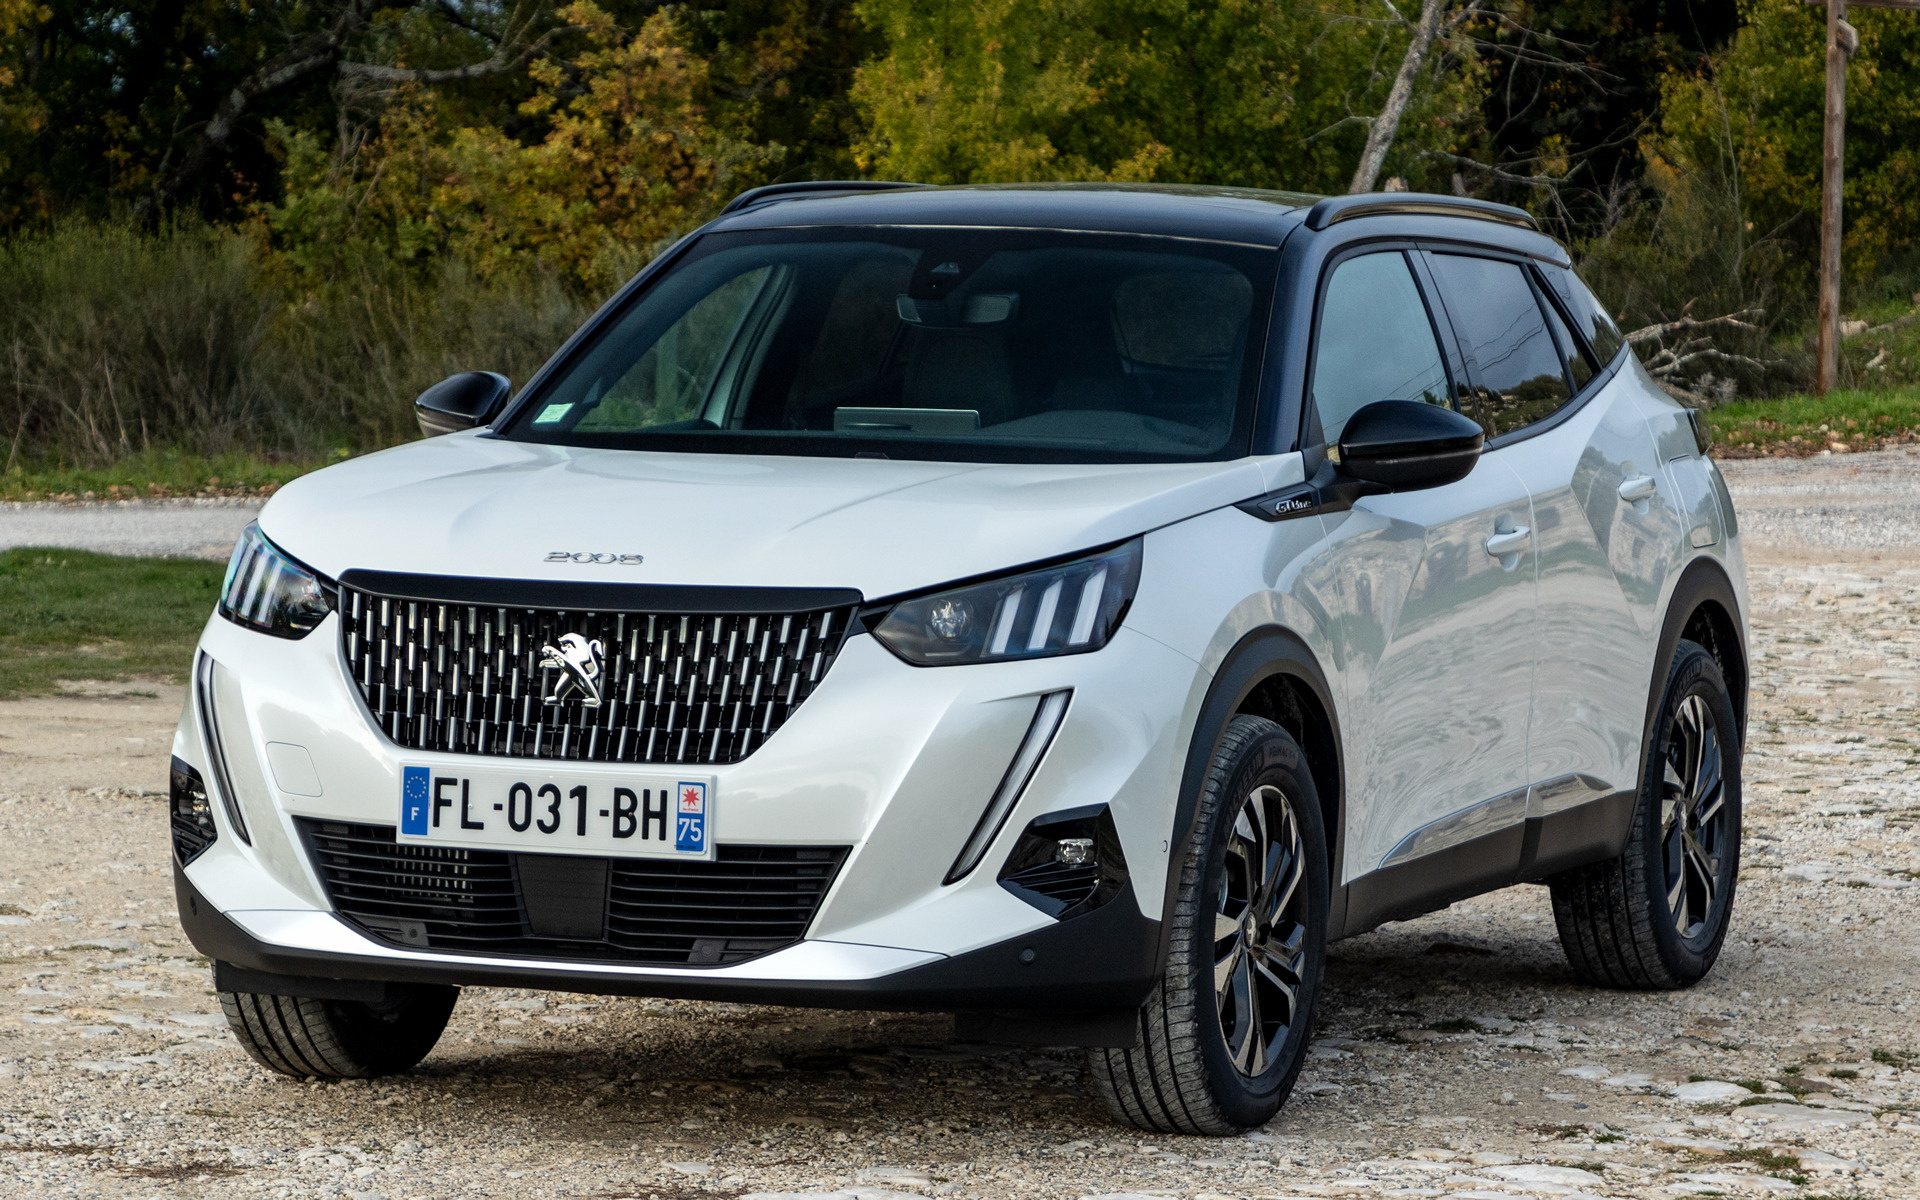 2019 Peugeot 2008 Gt Line Papeis De Parede E Imagens De Fundo Em Hd Car Pixel